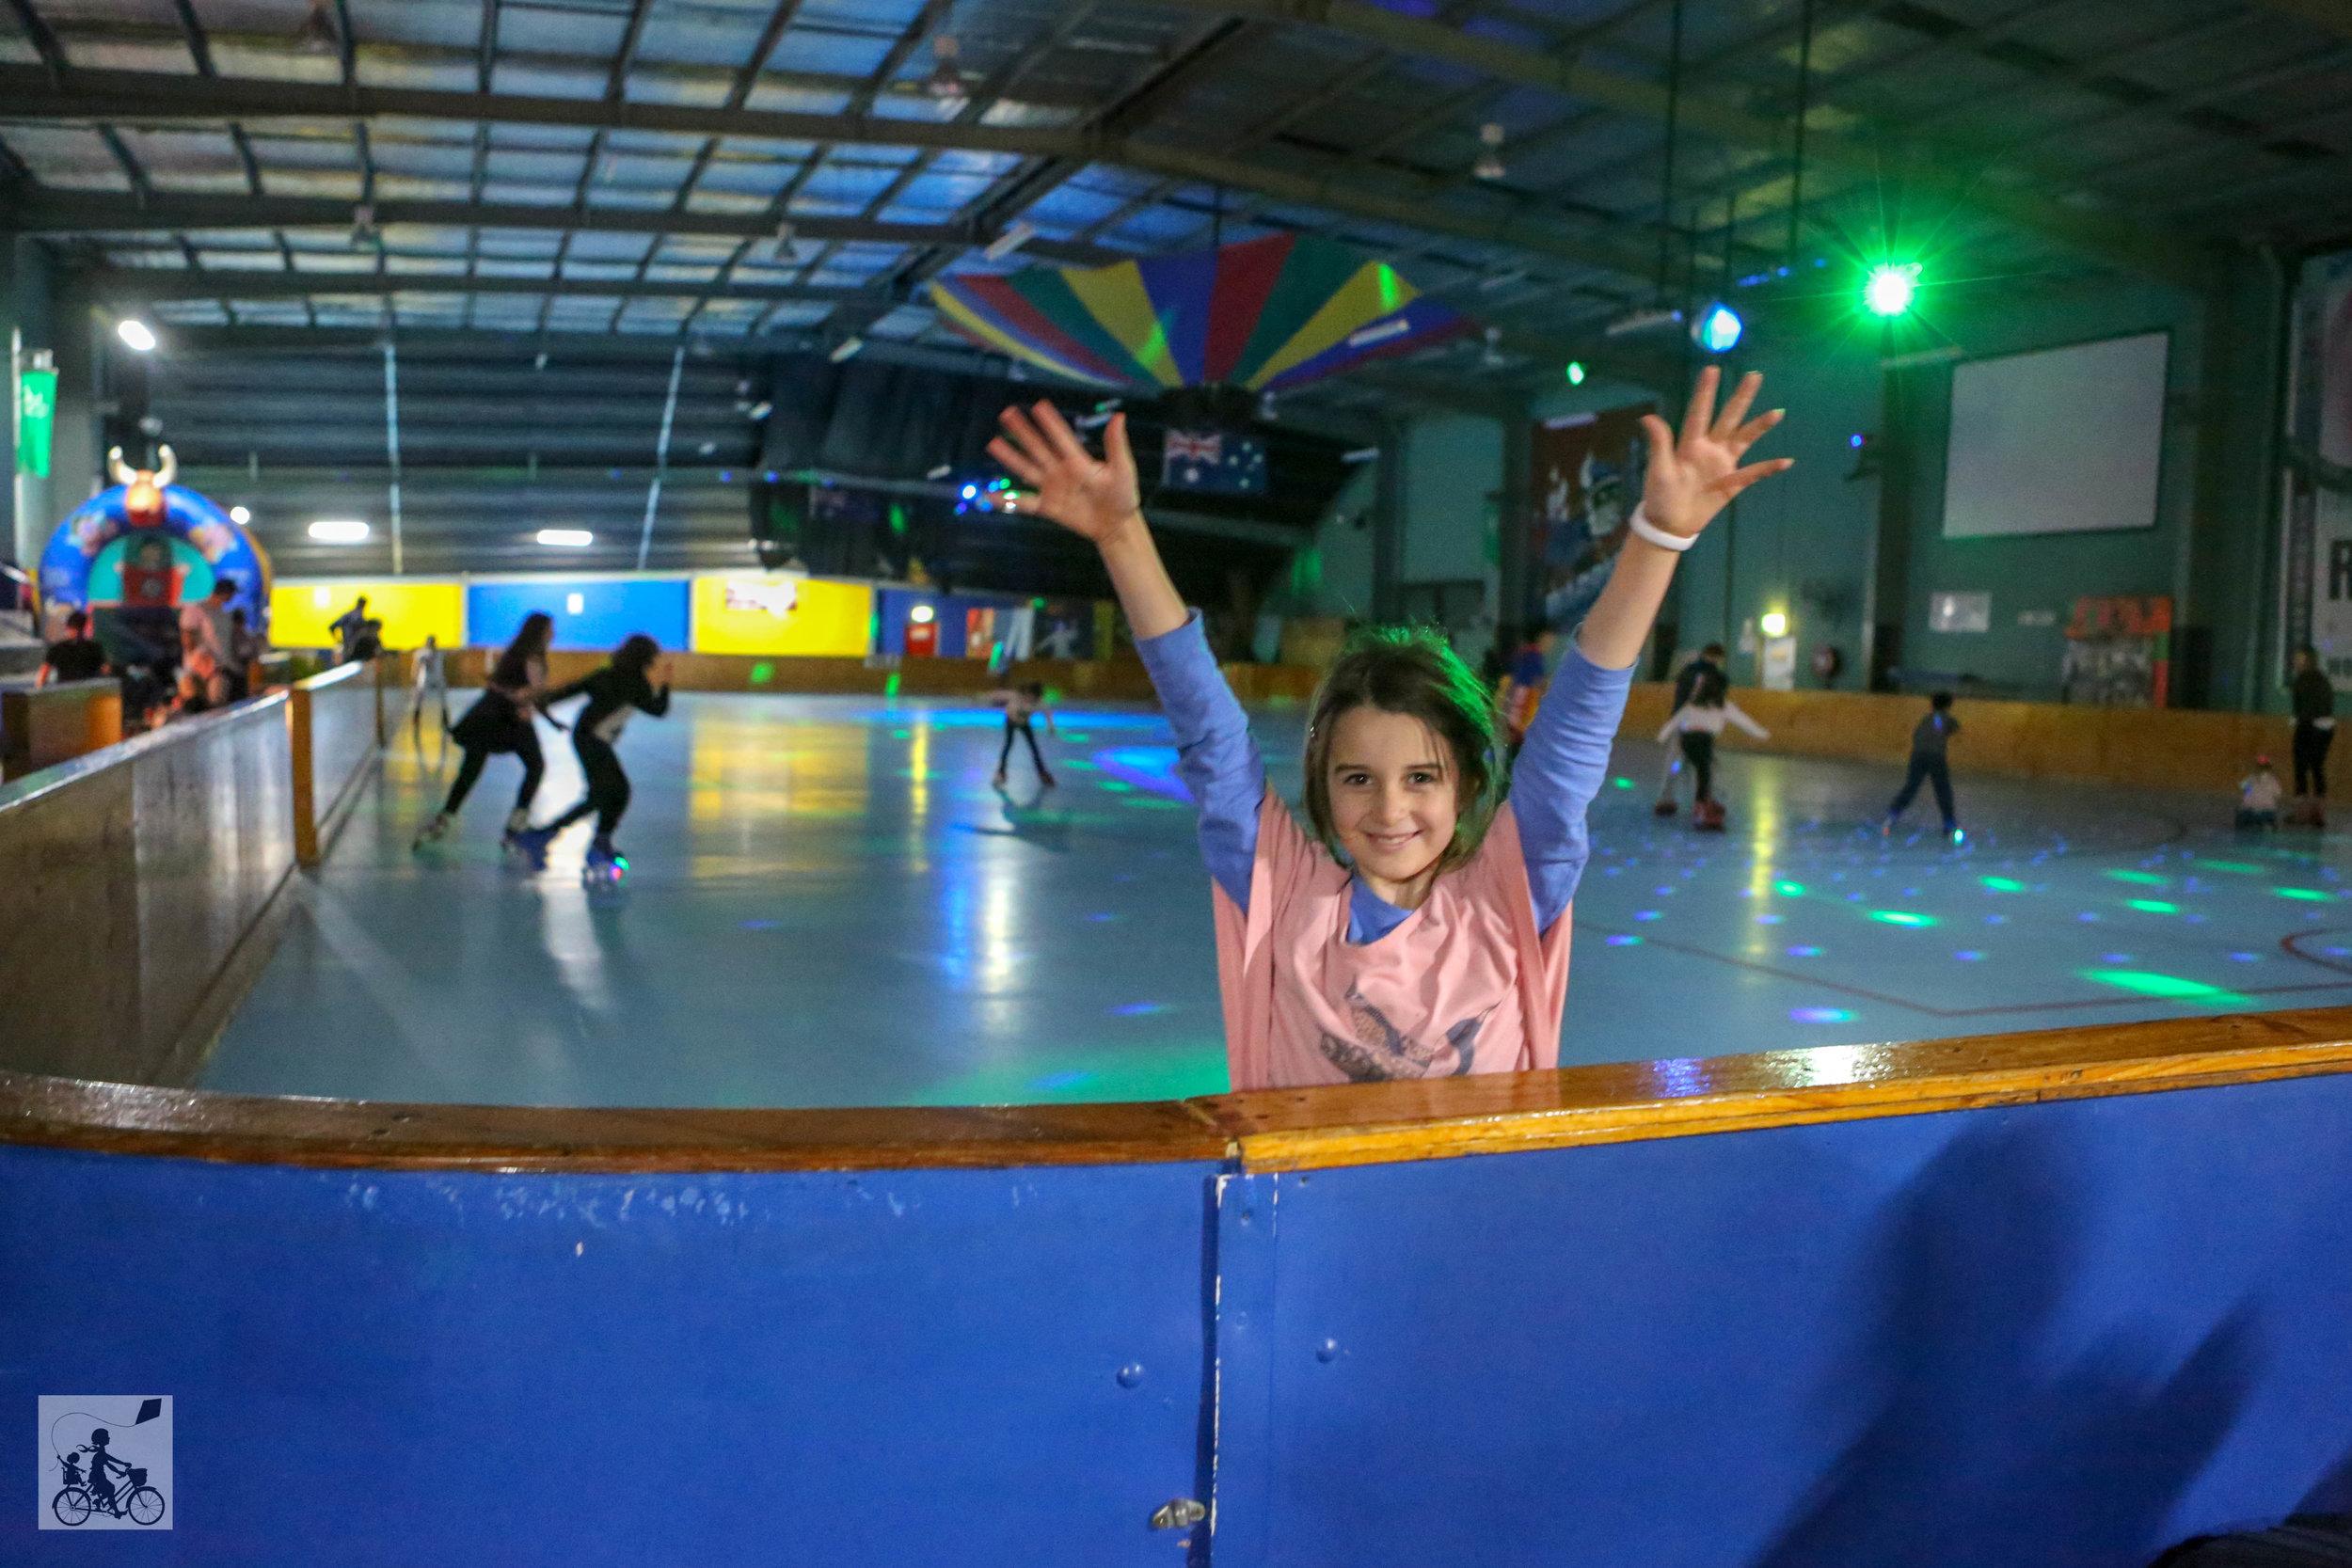 Sunshine Skate Centre - Mamma Knows West (1 of 13).jpg